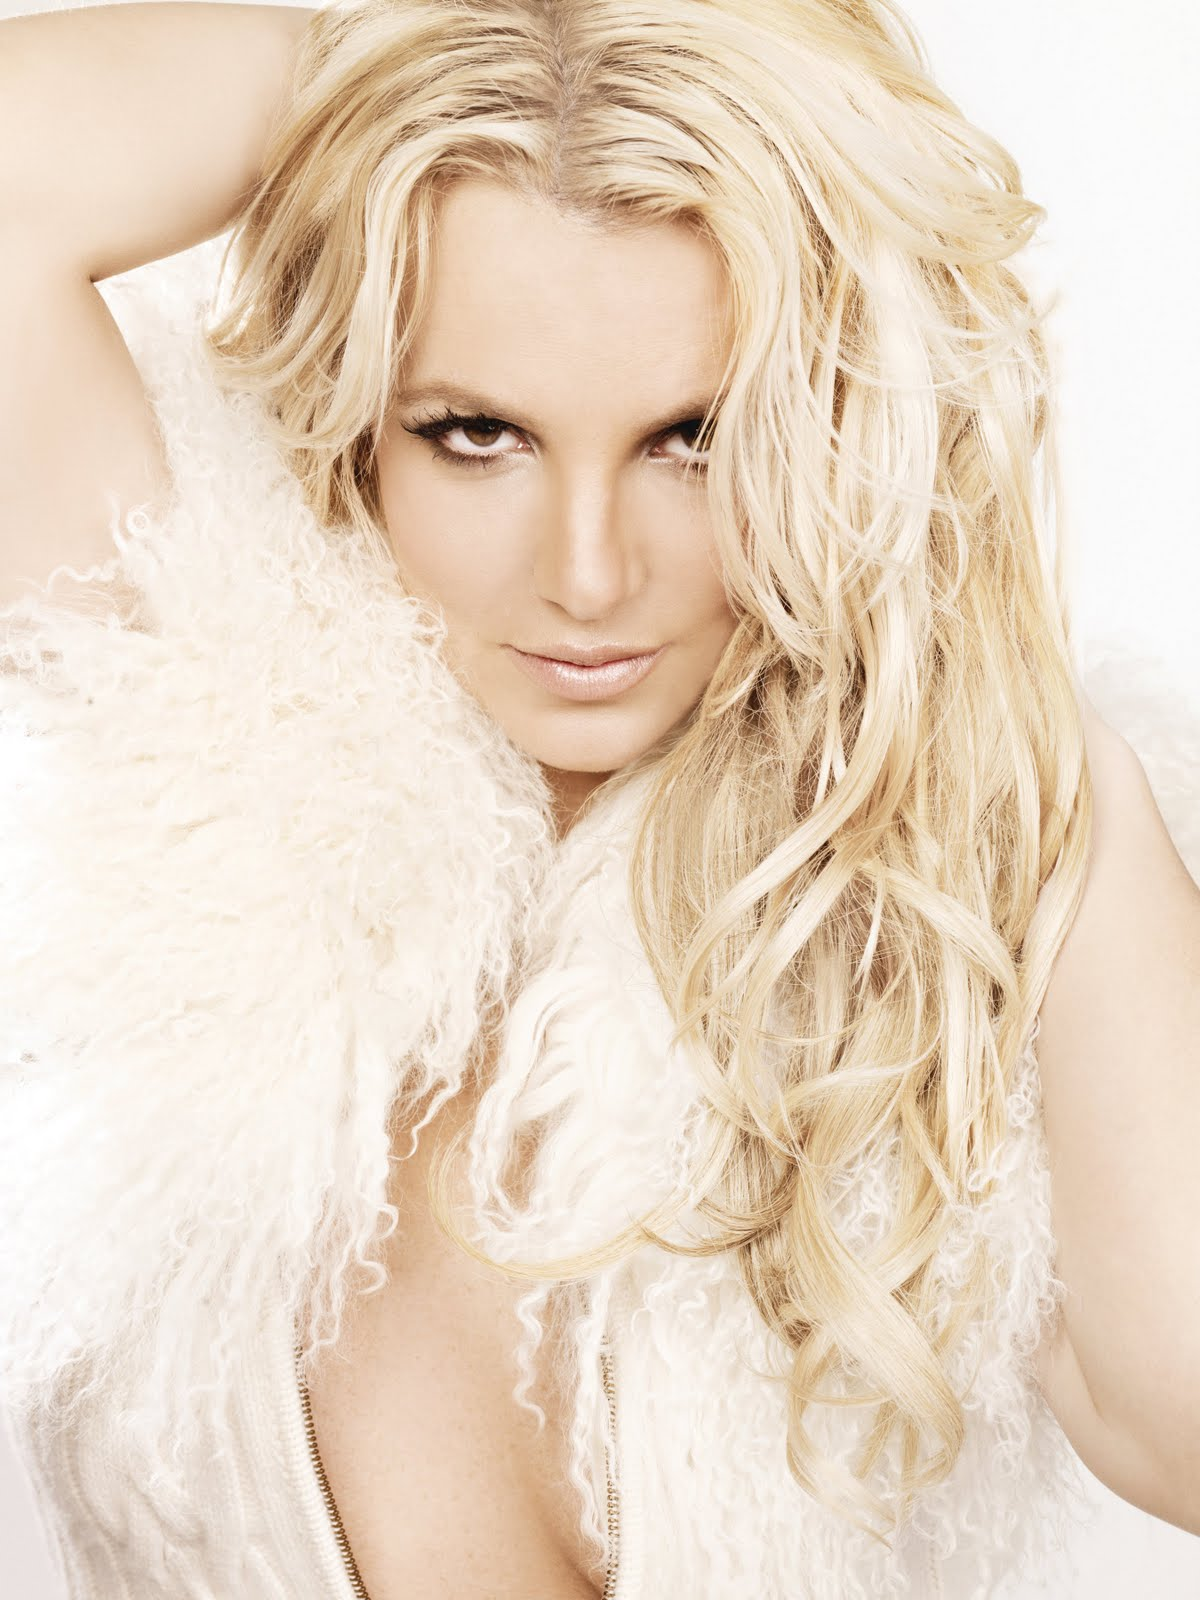 http://2.bp.blogspot.com/-8dnyYYHOhs0/TuSoyfeyD7I/AAAAAAAAGsk/3JnrtsYSQzw/s1600/Britney%2BSpears_-_Femme%2BFatale%2B1200x1600.jpg